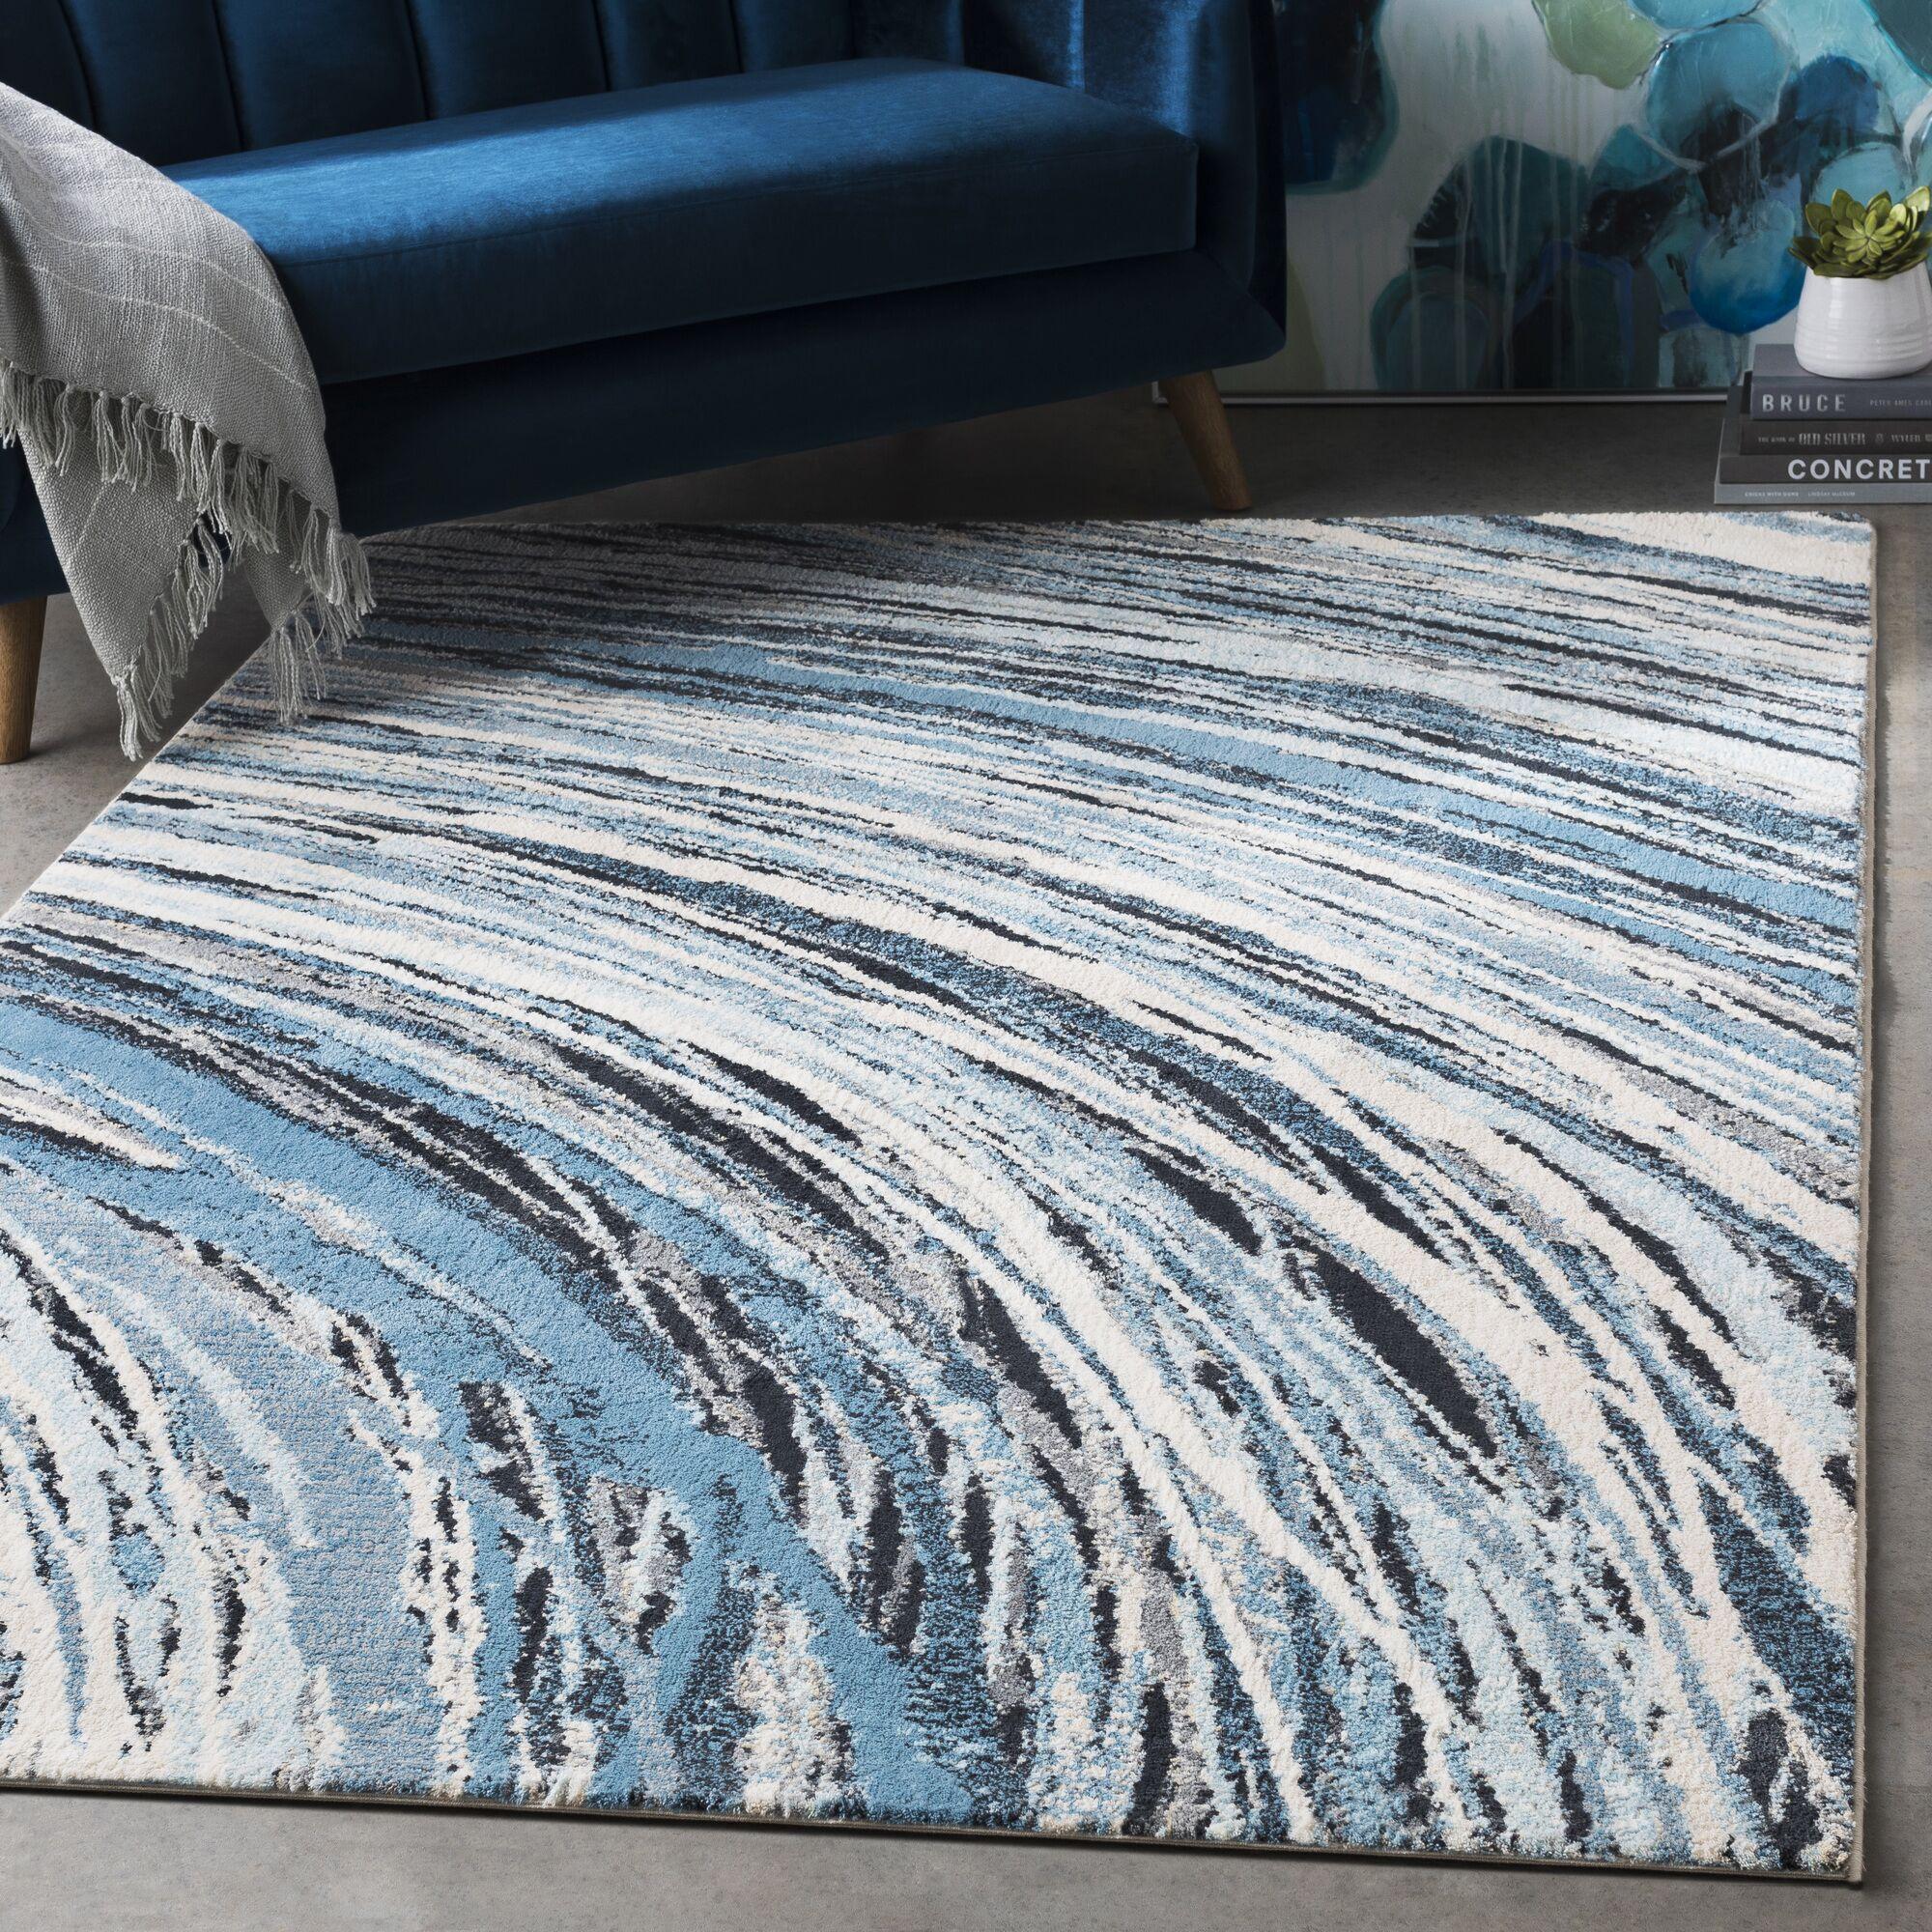 Siena Super Soft Contemporary Bright Blue/Ivory Area Rug Rug Size: Rectangle 7'6